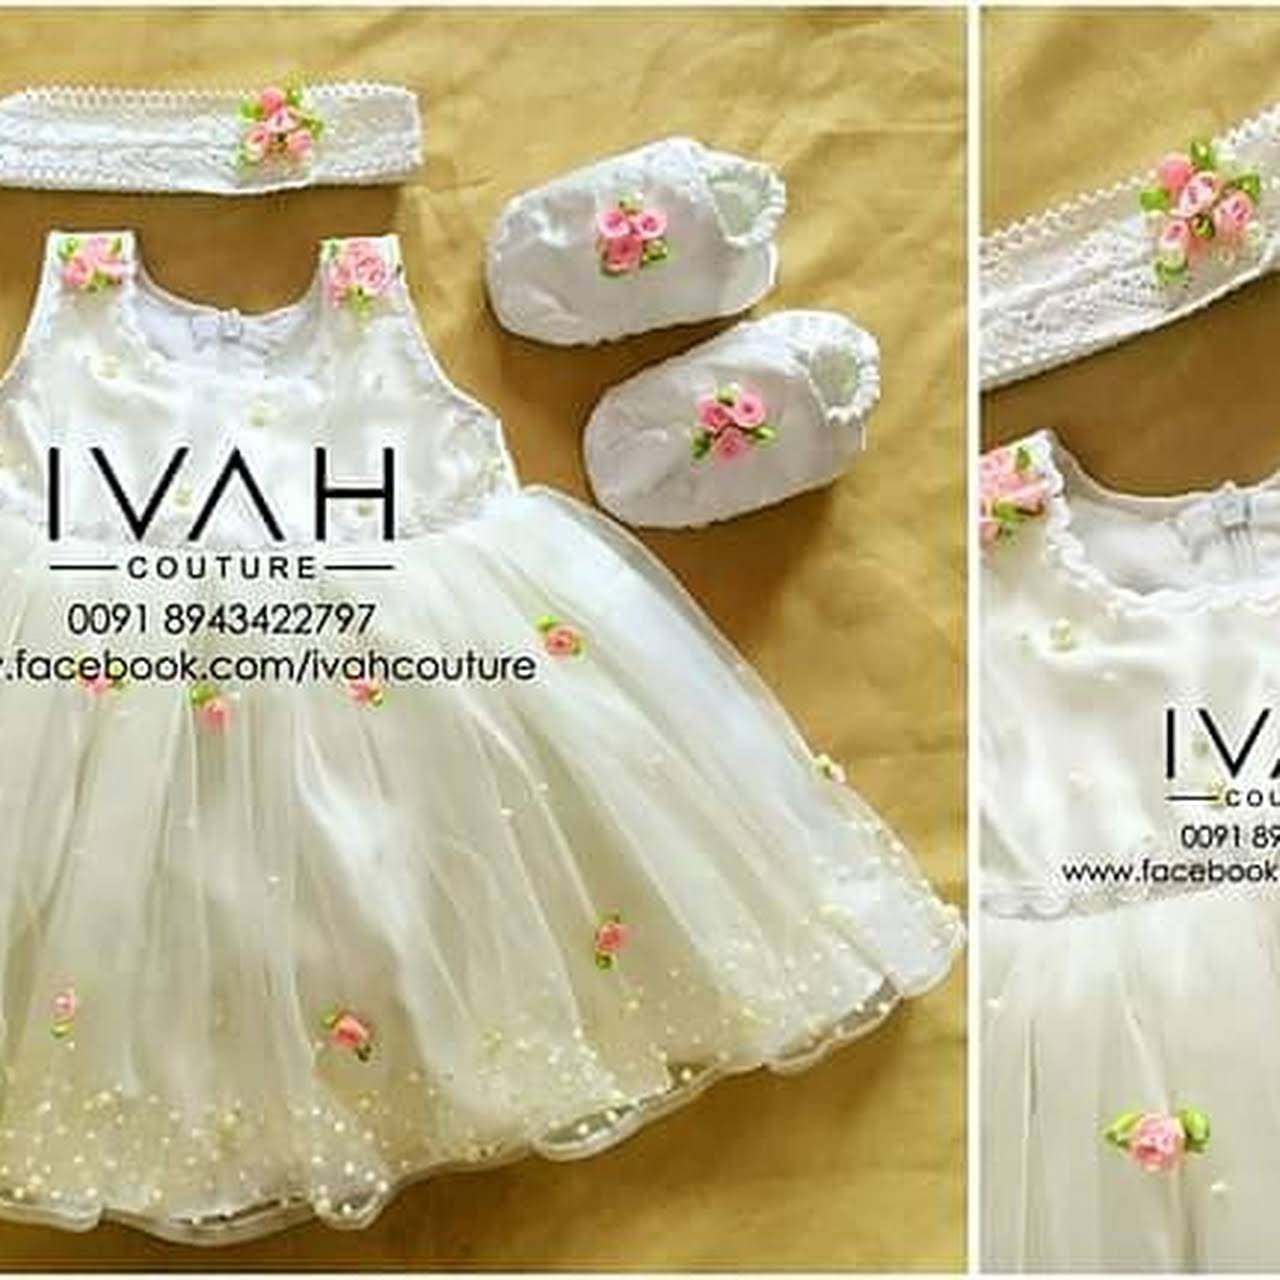 Ivah Couture Designer Boutique In Kerala Boutique In Adoor